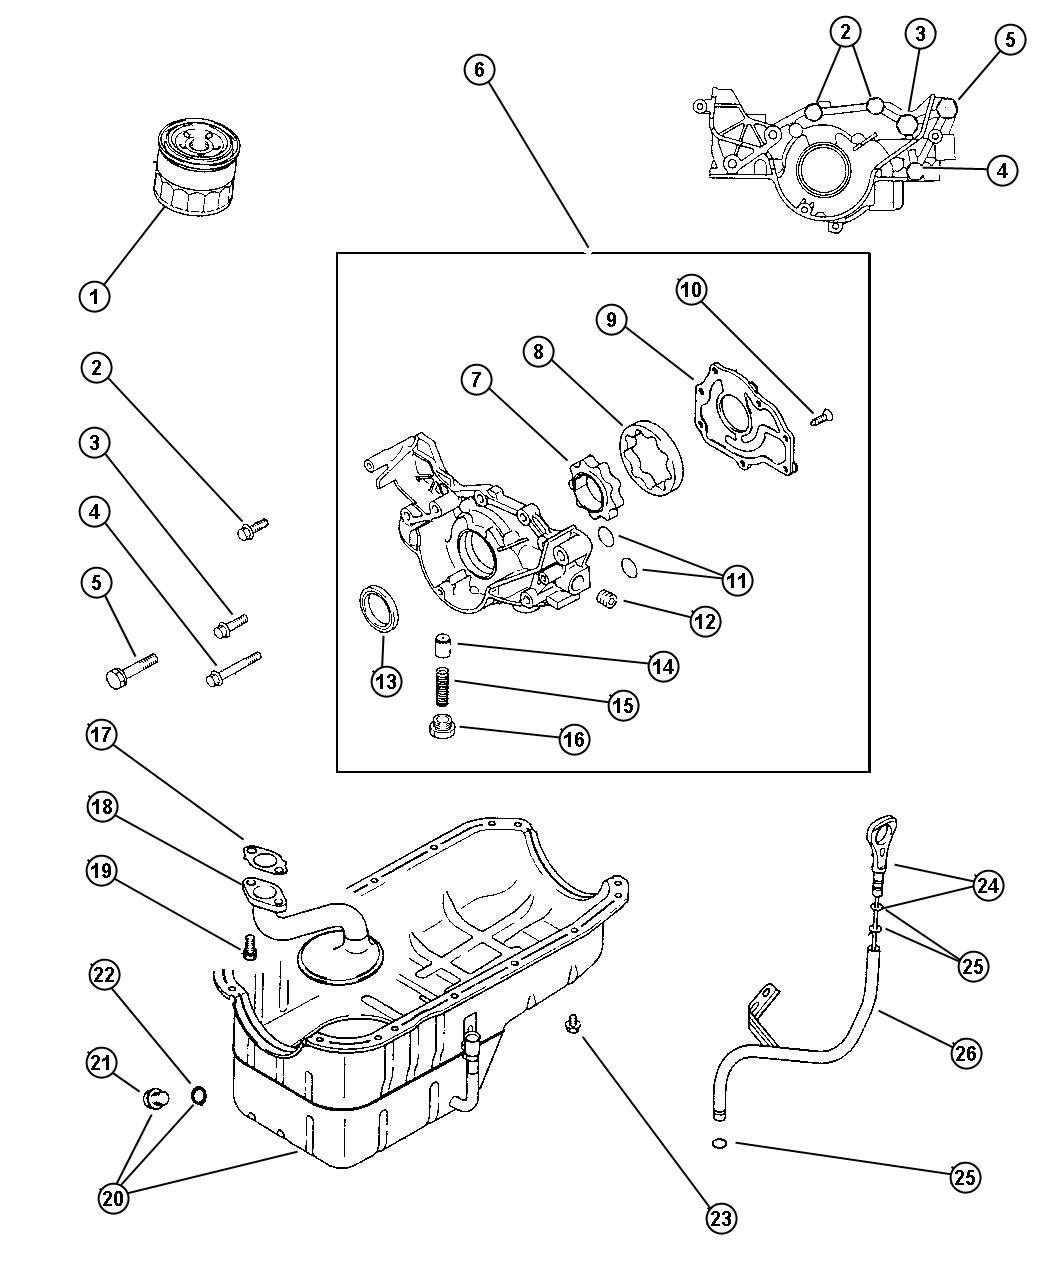 Chrysler Cirrus Bolt Hex Flange Head M8x30 Engine Front